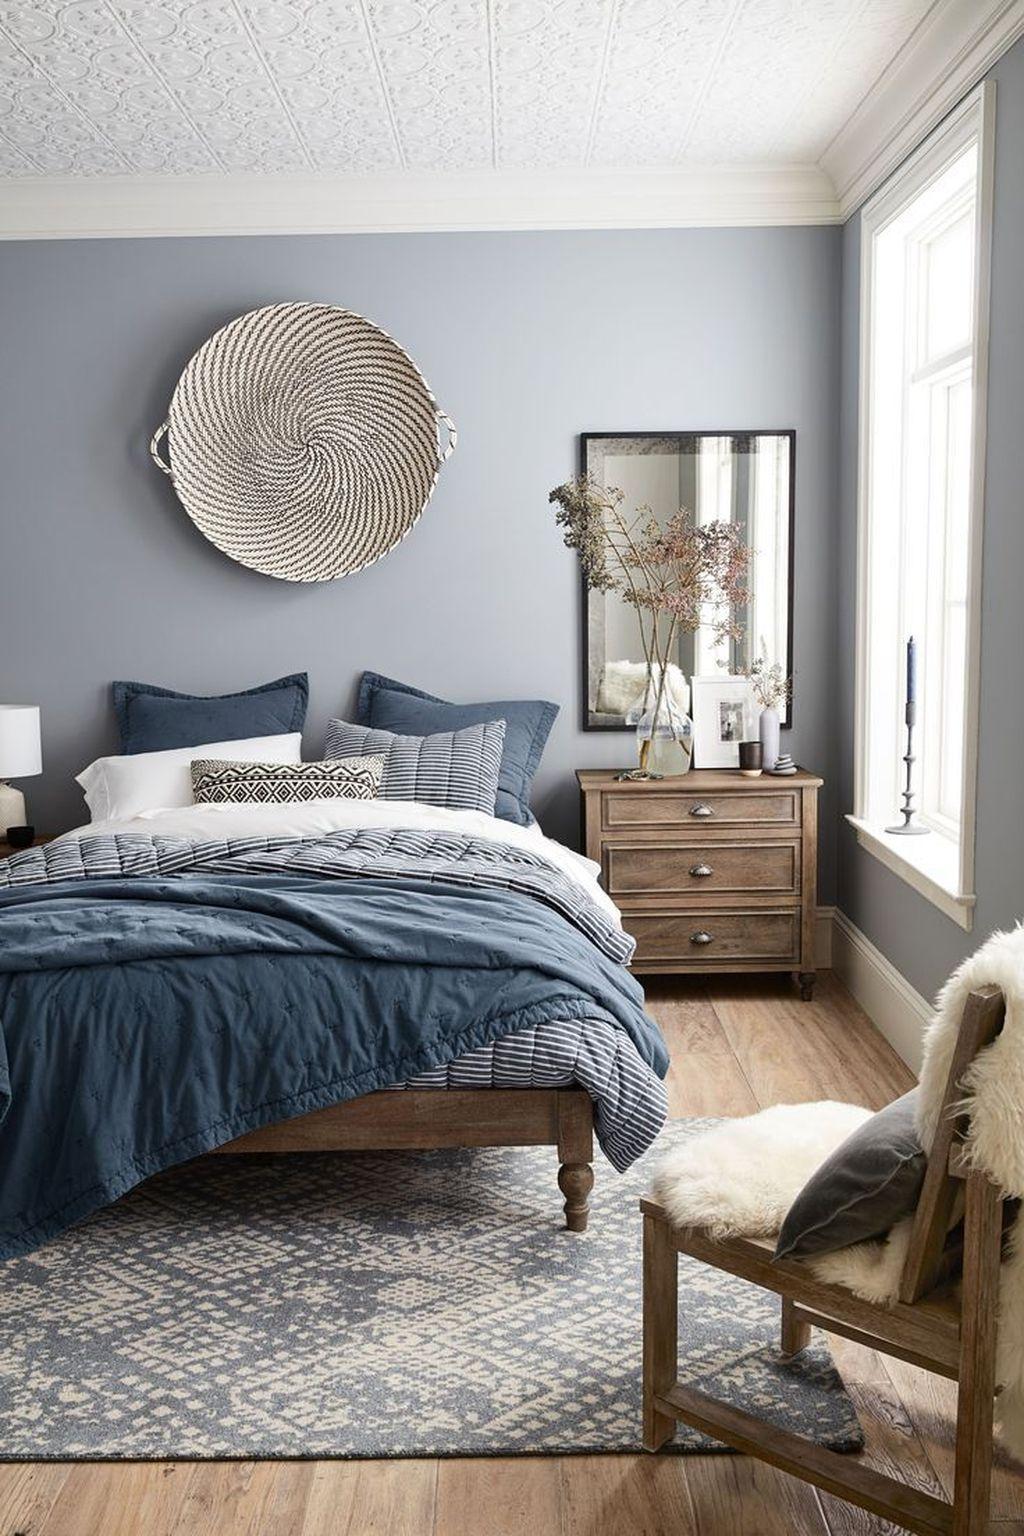 Beautiful blue and gray bedroom design ideas bedroom in